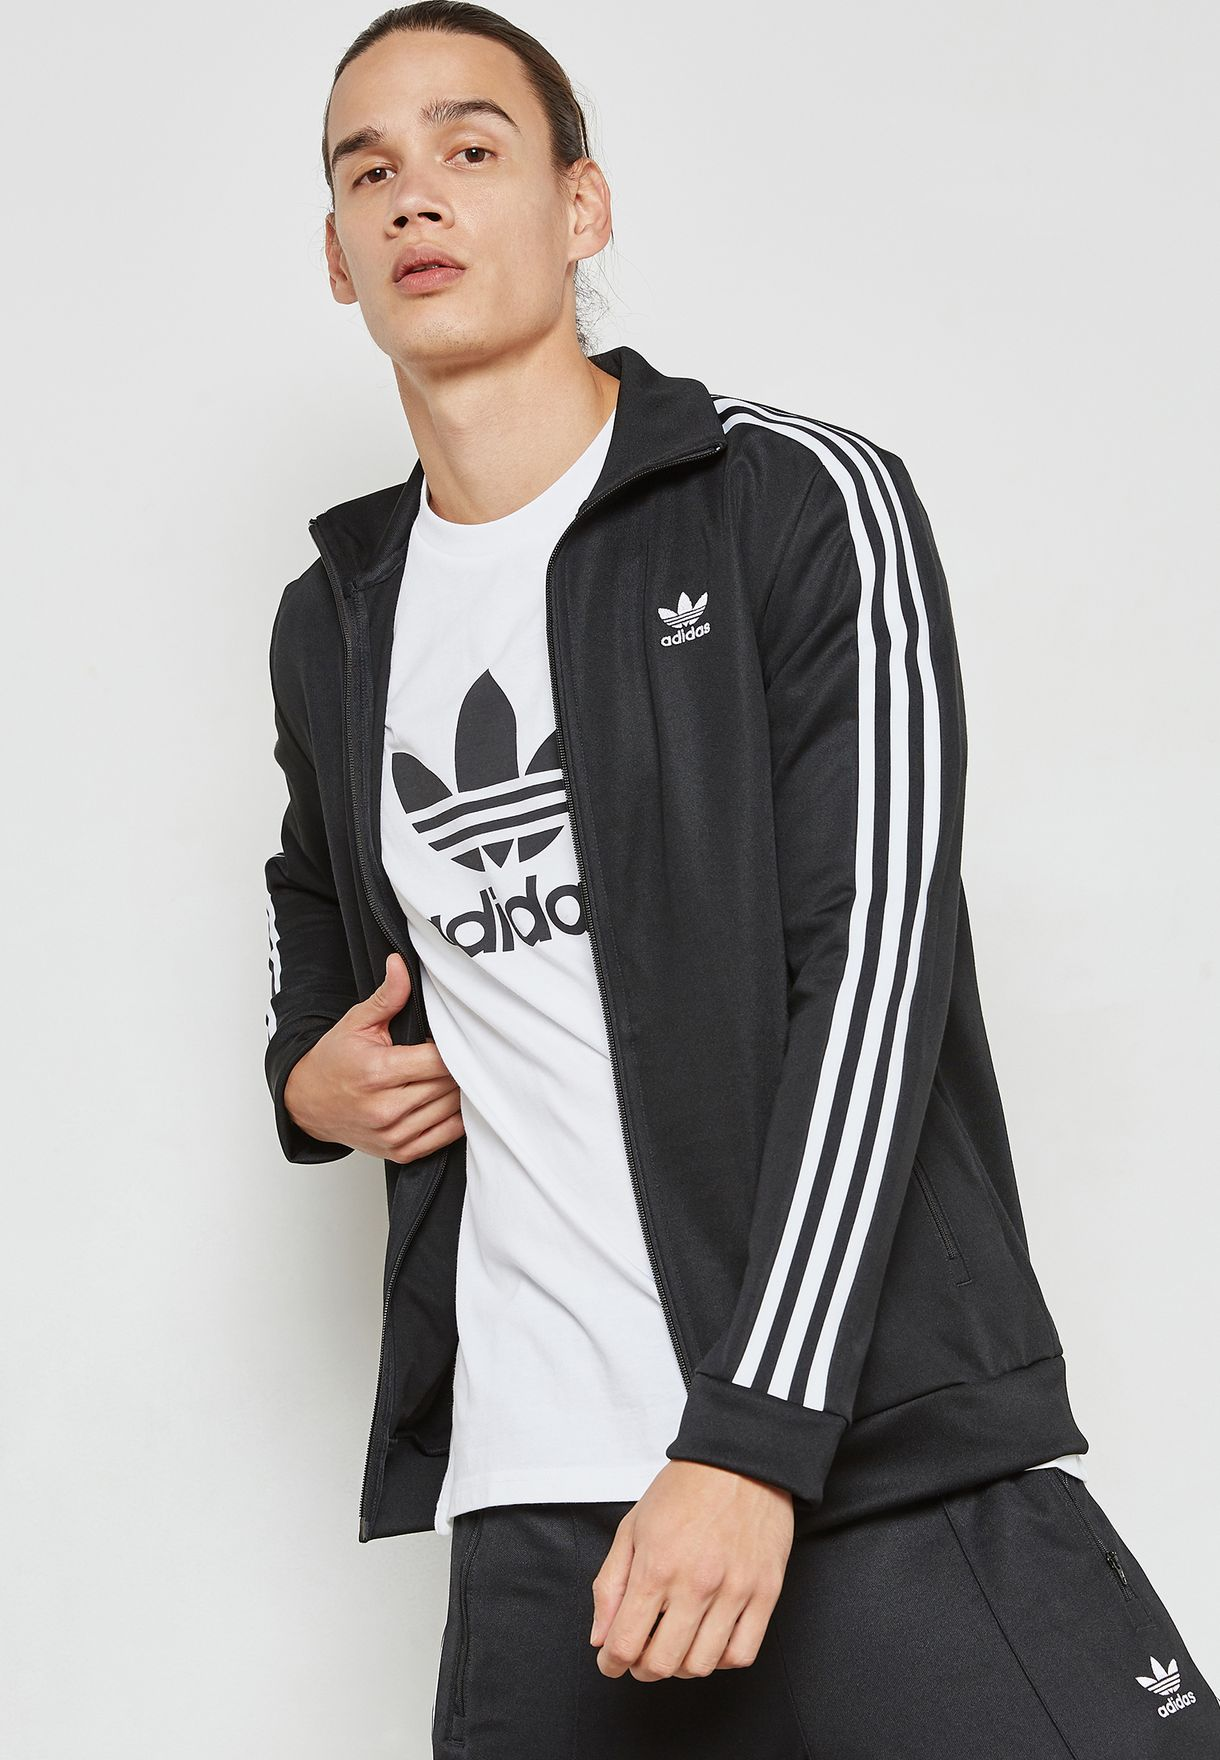 e56fec405aa8 Shop adidas Originals black adicolor Beckenbauer Track Jacket CW1250 ...